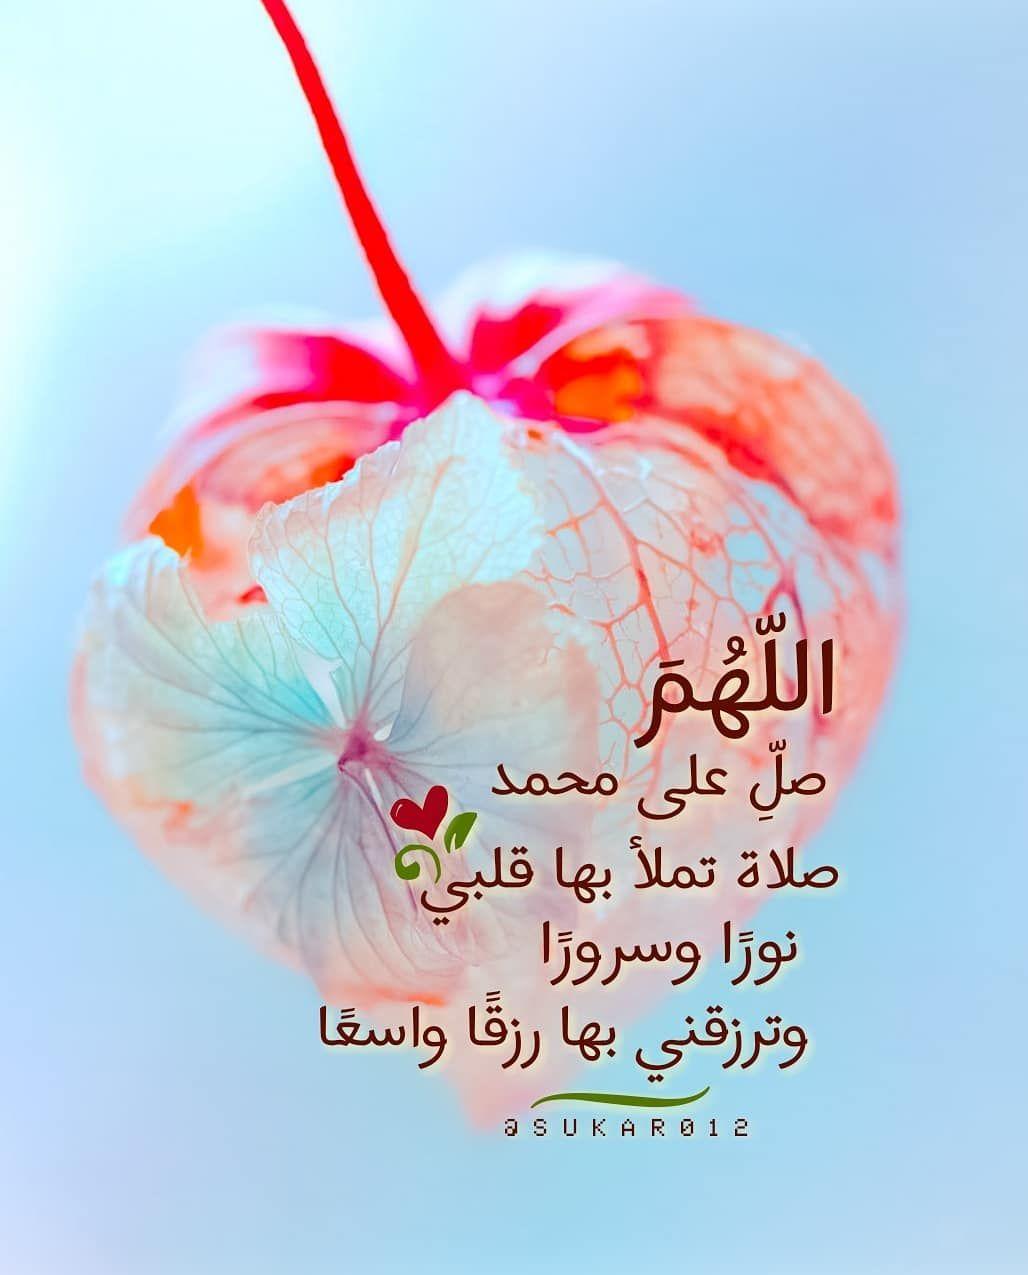 Sukar012 Shared A Photo On Instagram الله م صل على م حمد صلاة تملأ بها قلبي ن ور ا وصلاح ا Beautiful Arabic Words Phone Wallpaper Quotes Good Morning Gif